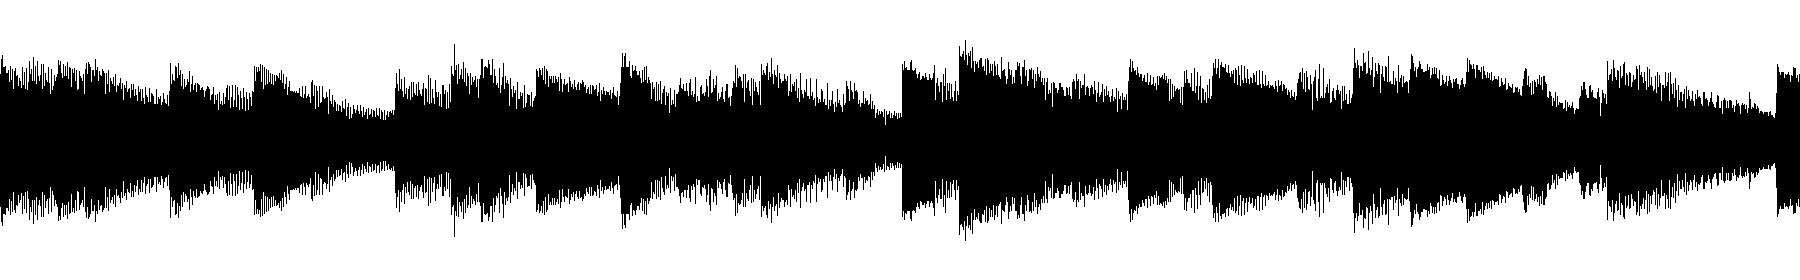 Sad Guitar Melody | Sample Focus